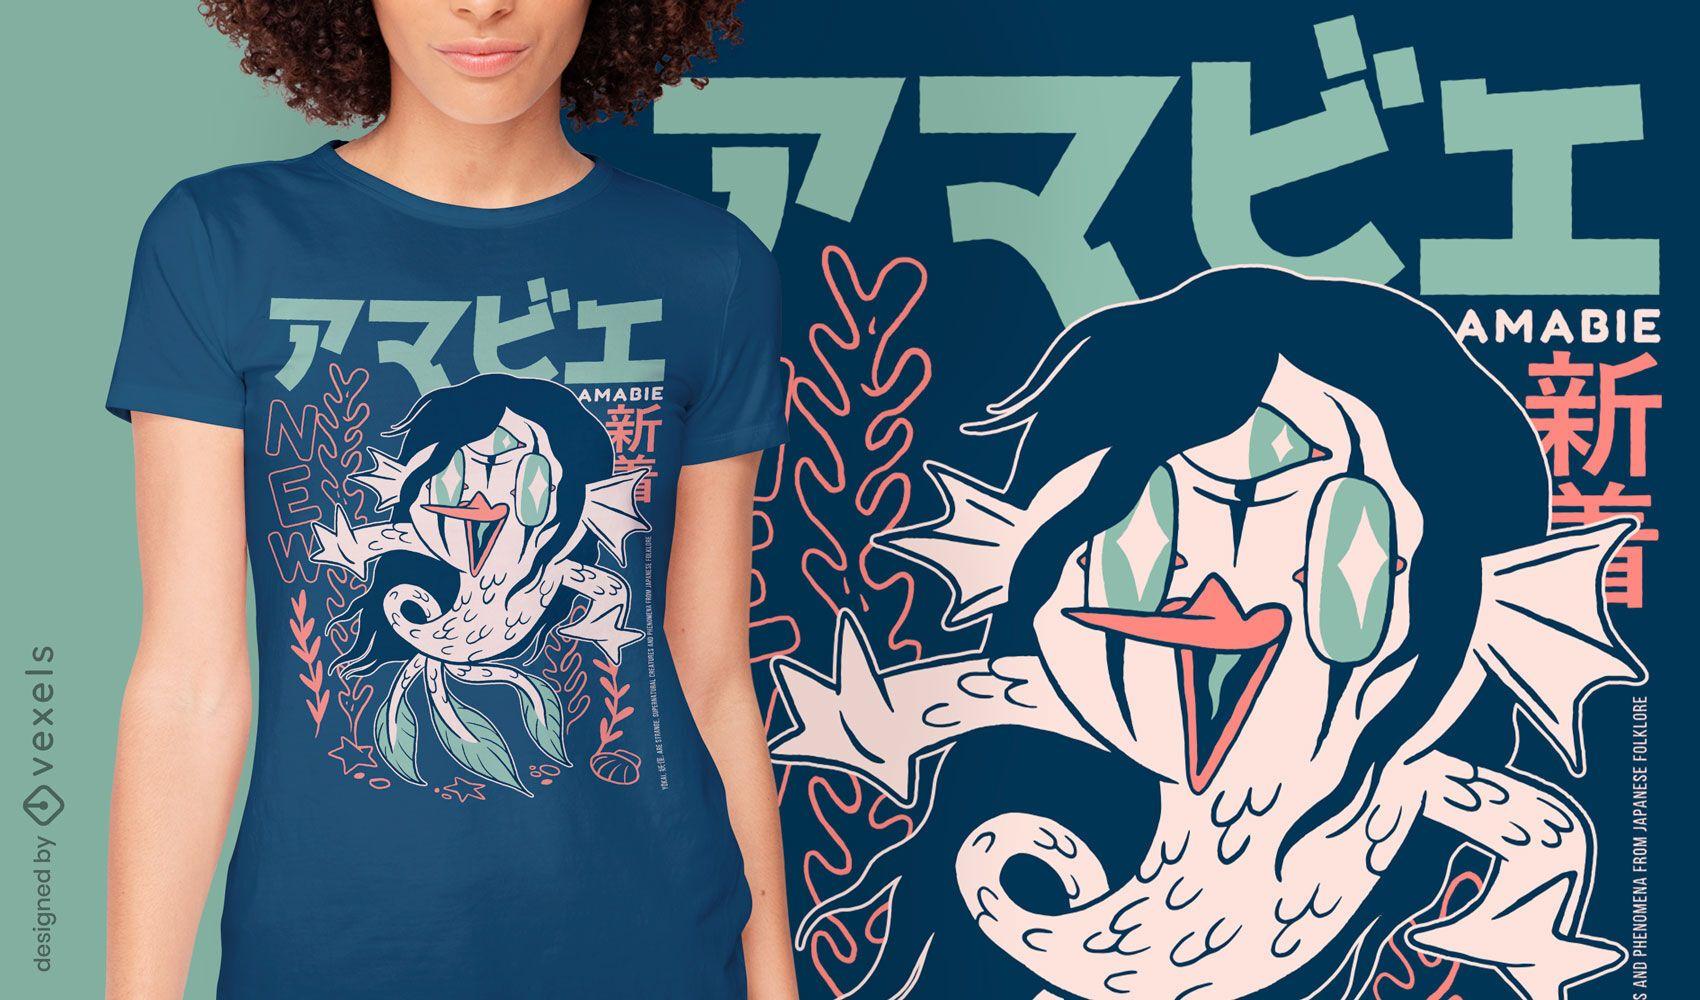 Amabie japanese yokai t-shirt design